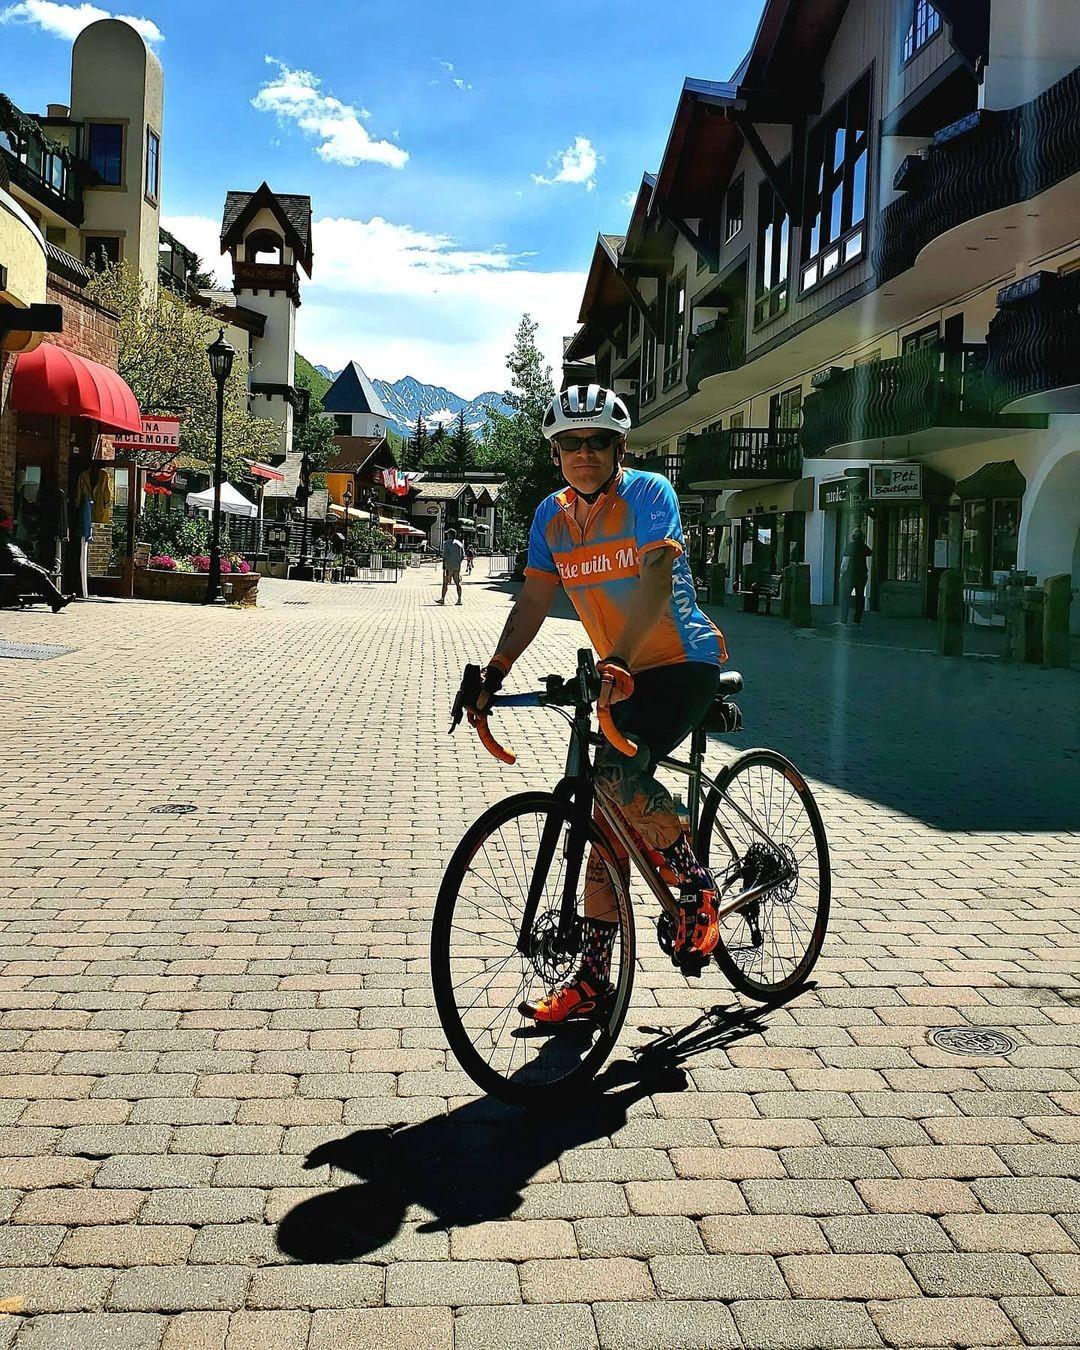 Joey on his bike